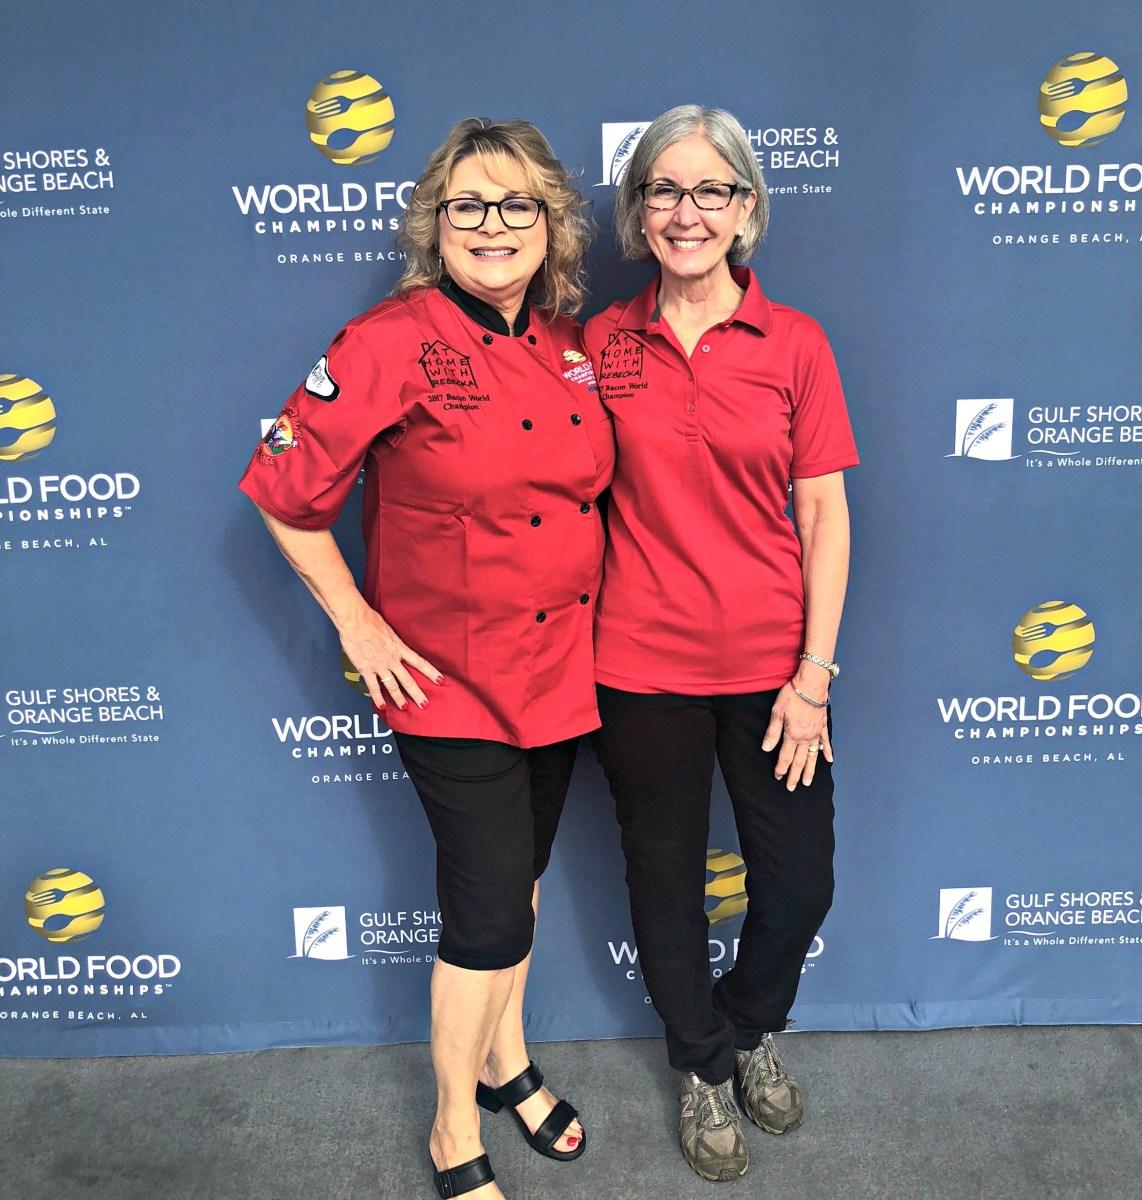 World Food Championships 2018 Recap